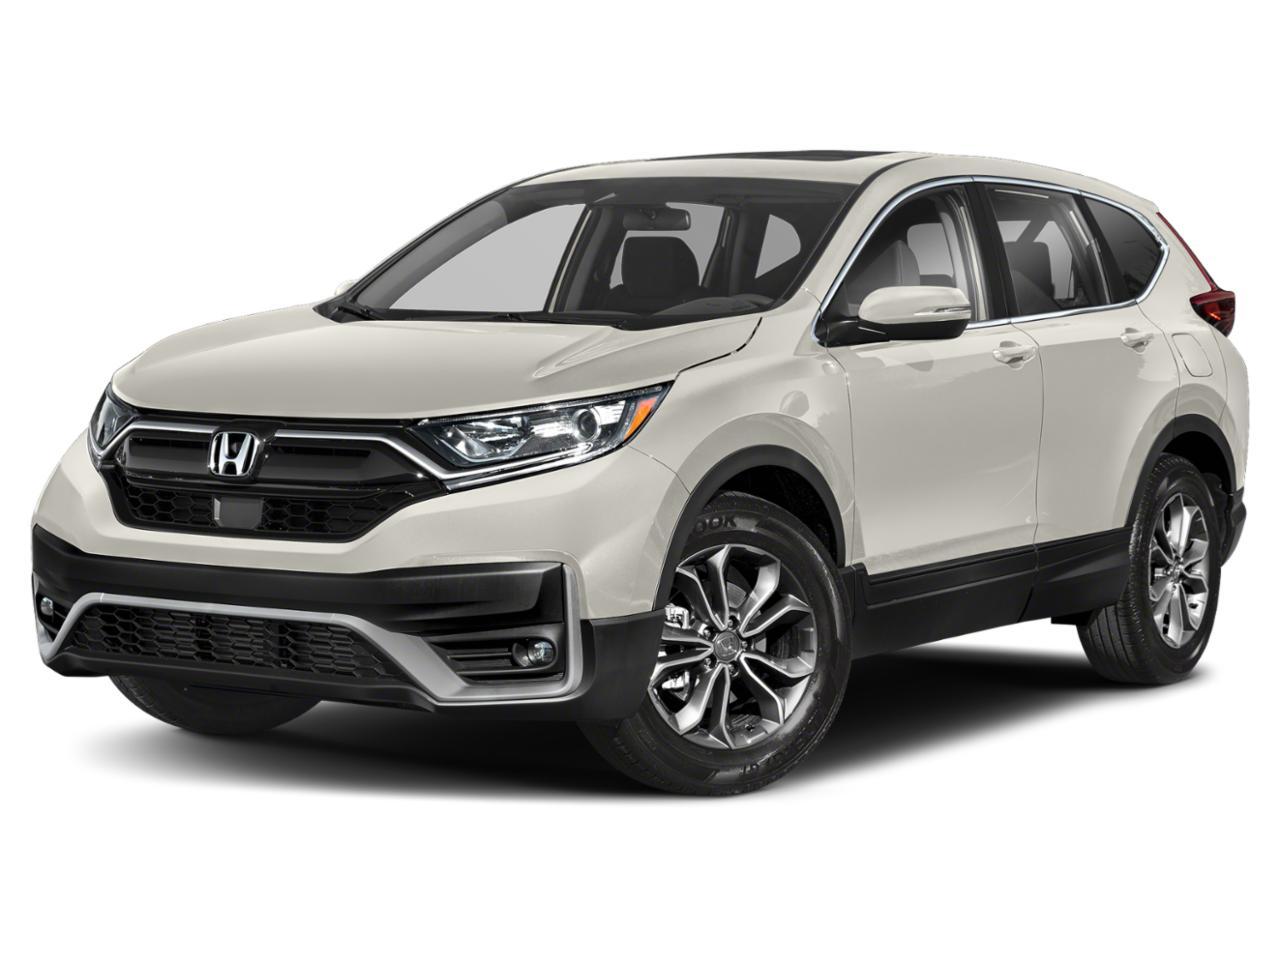 2020 Honda CR-V Vehicle Photo in San Antonio, TX 78238